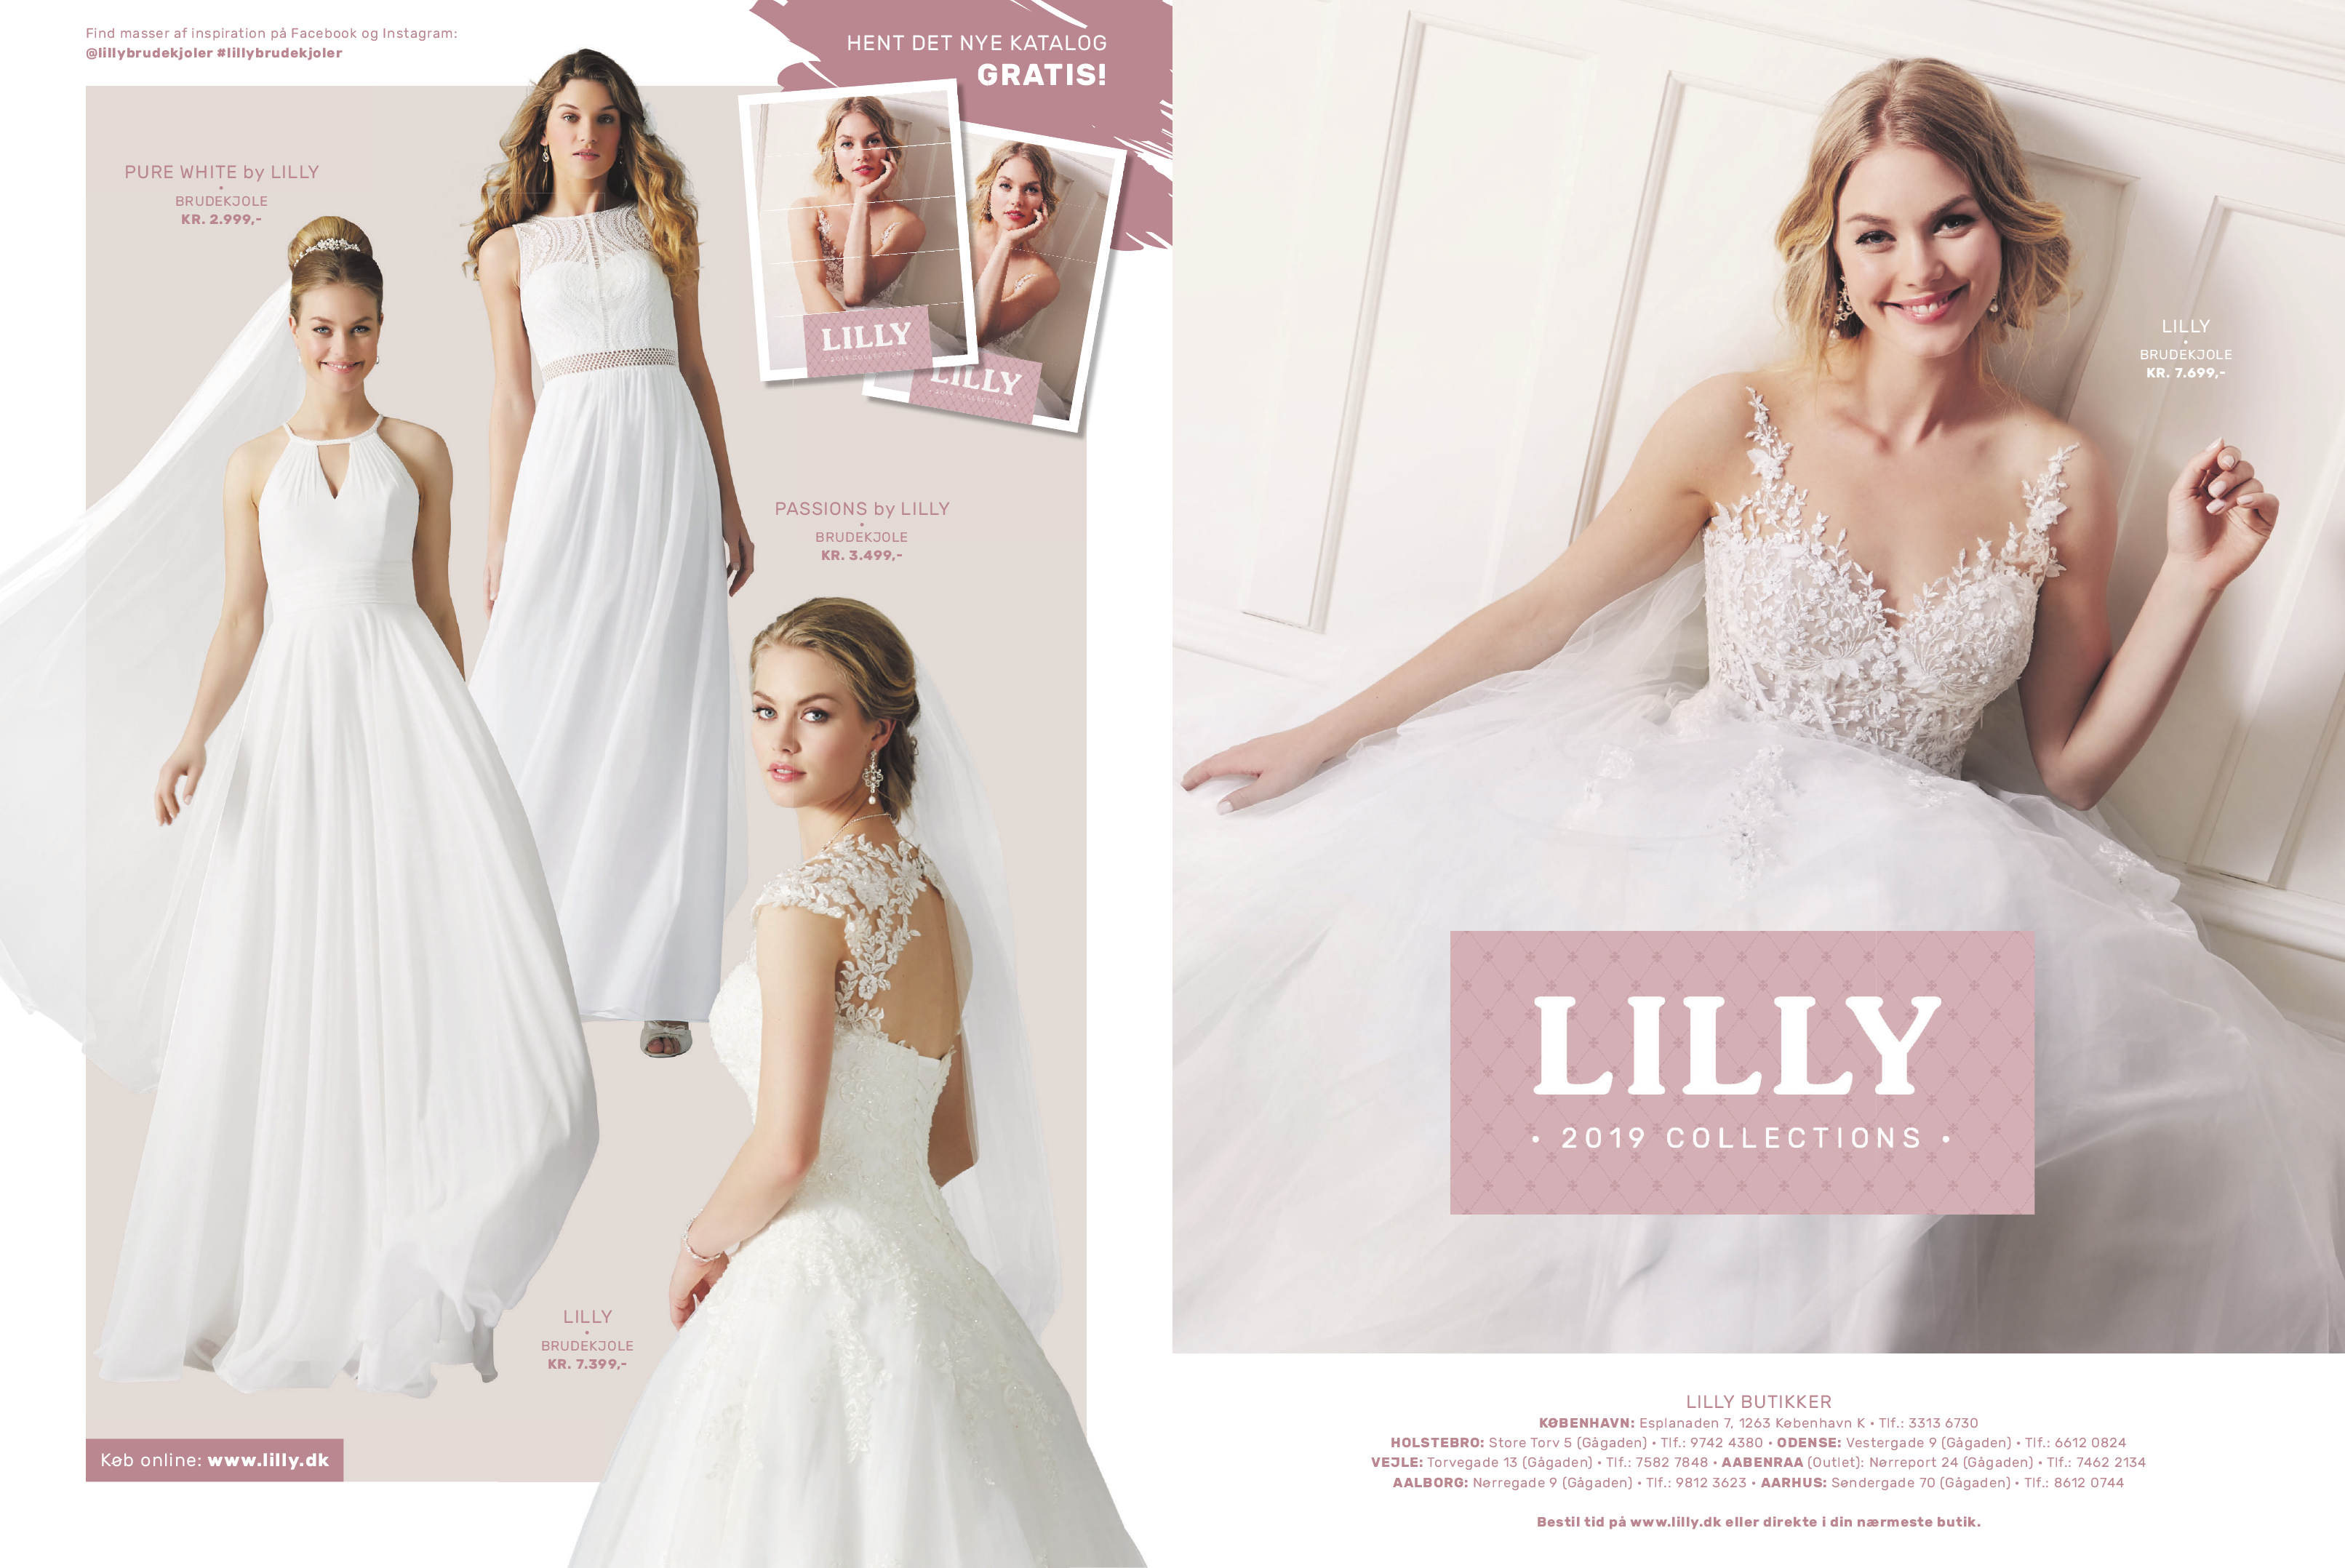 5d8c91df2c57 Lilly A S - E-Profil